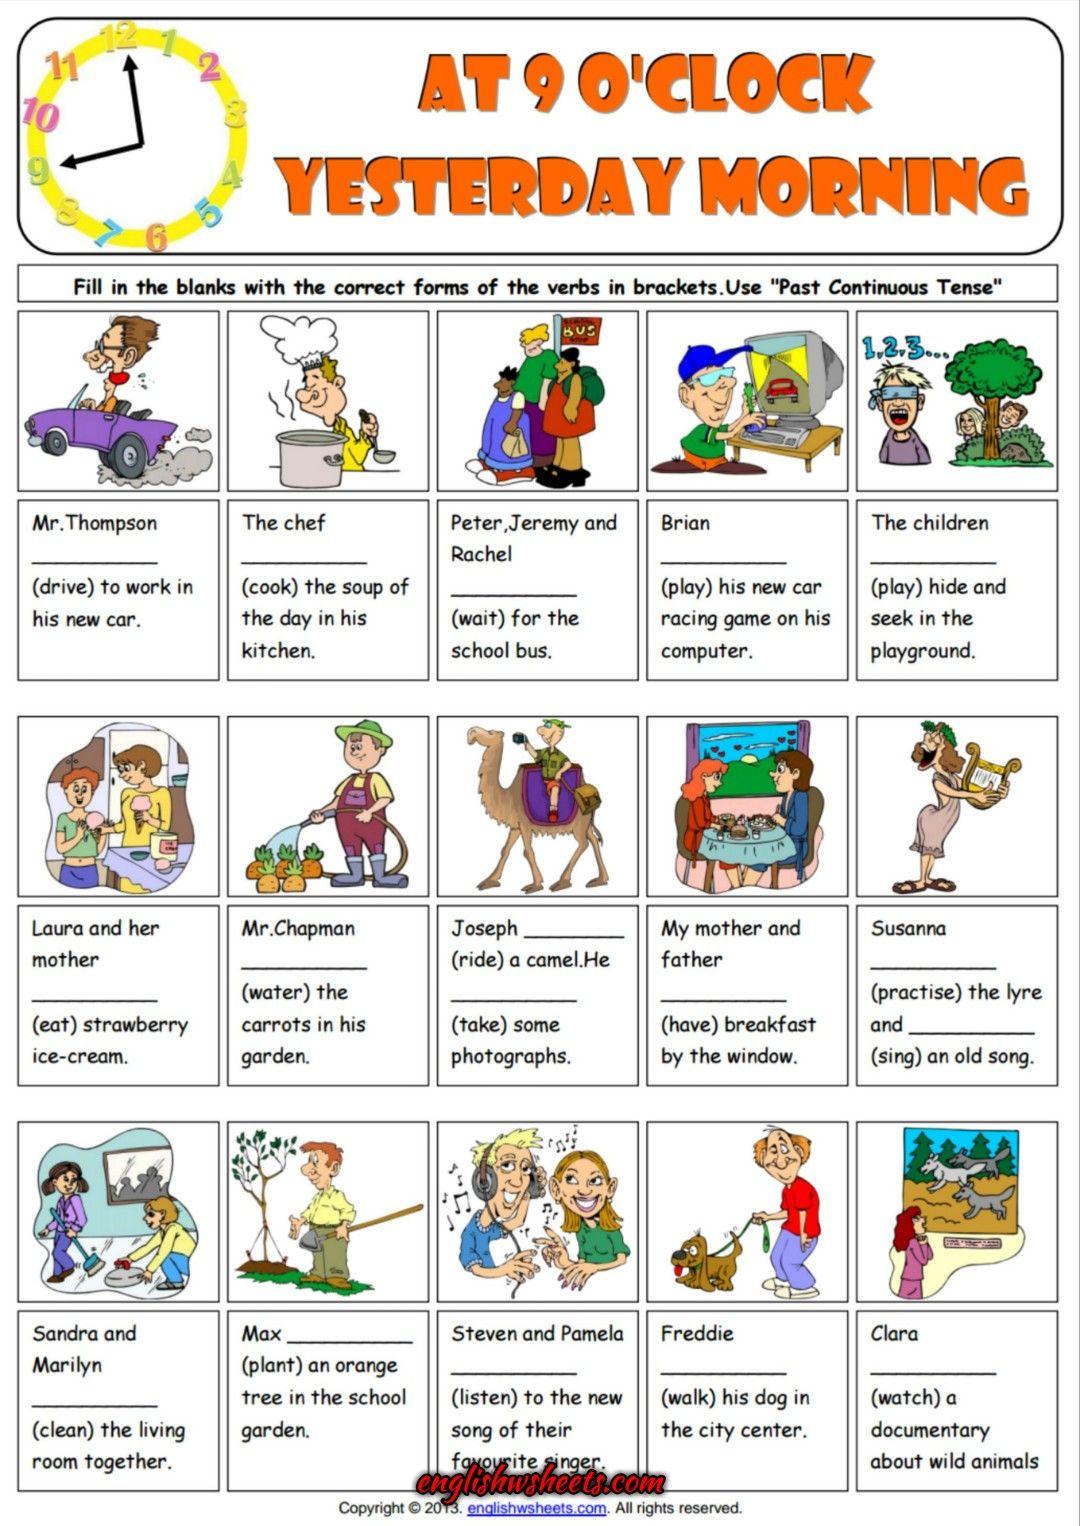 Past Progressive Tense ESL Grammar Exercise Worksheet | Esl ...